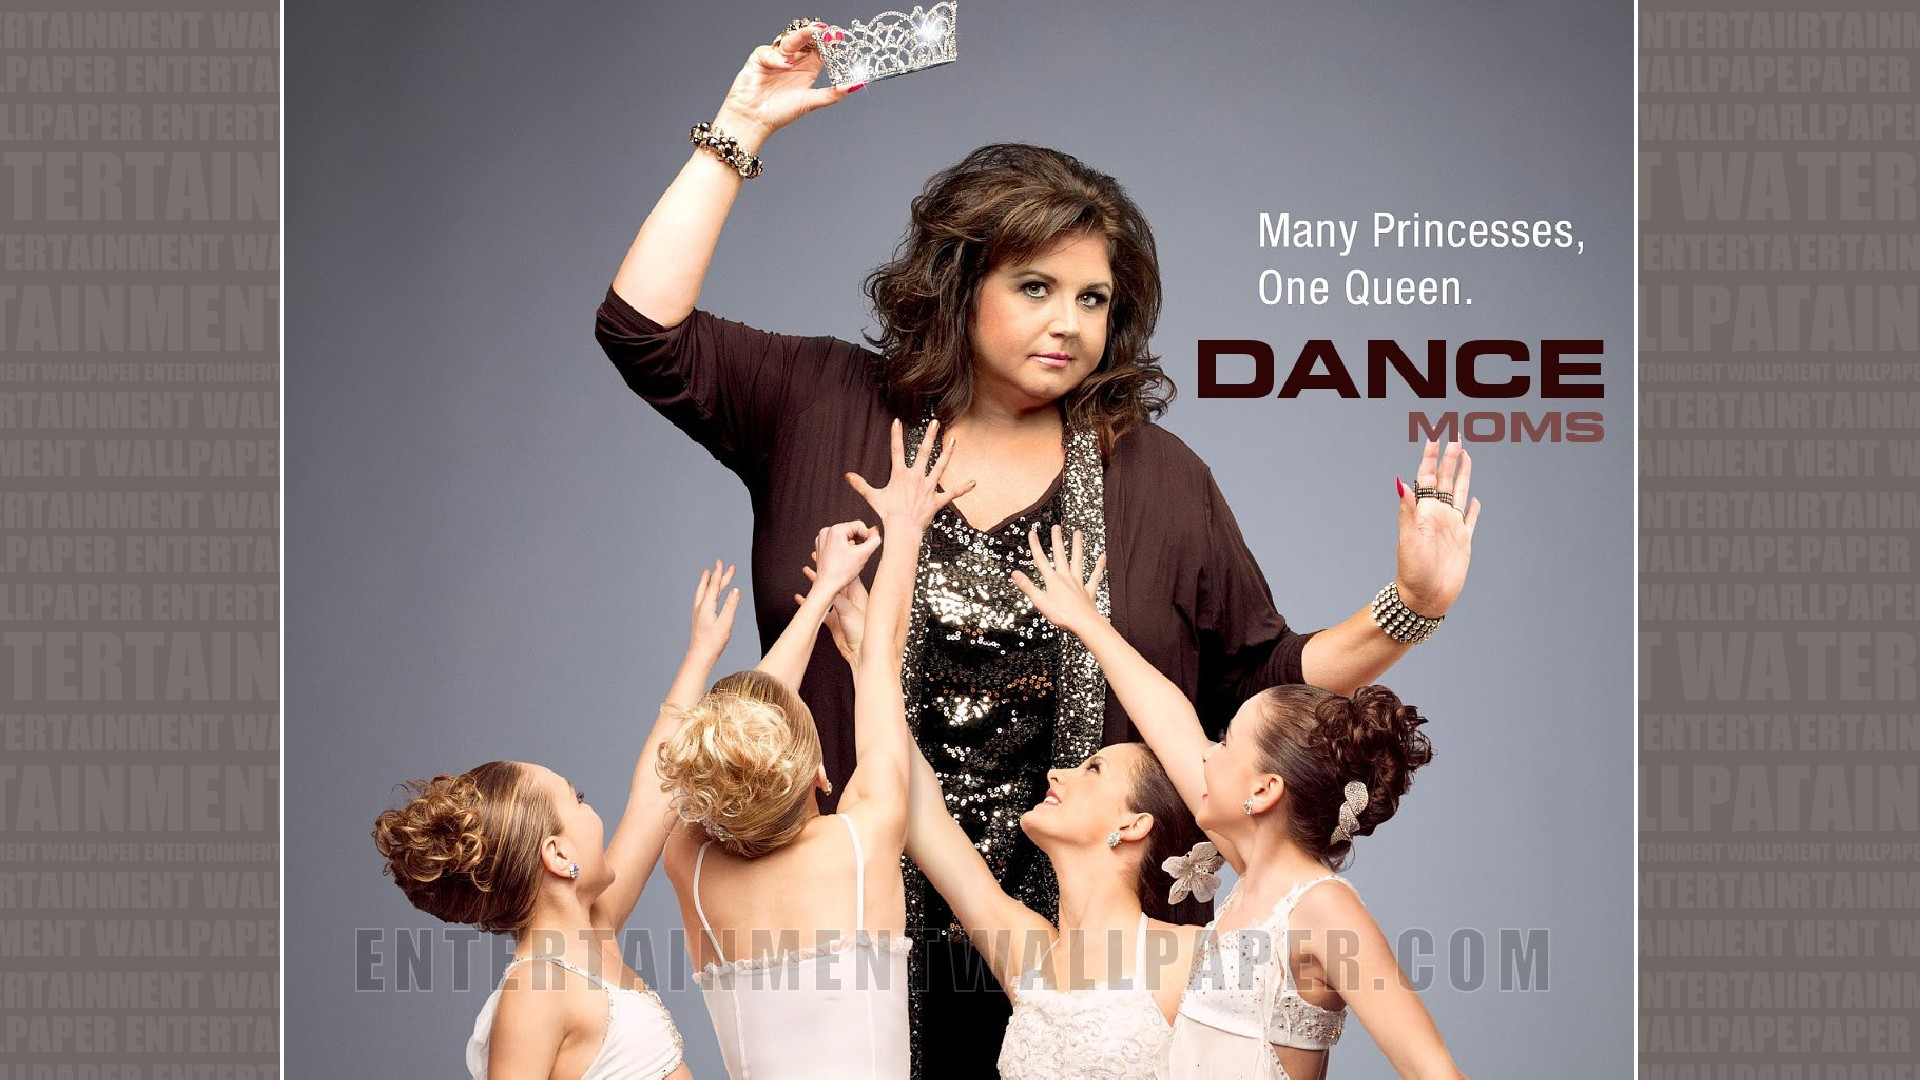 dance moms wallpaper 20040440 size 1920x1080 more dance moms wallpaper 1920x1080